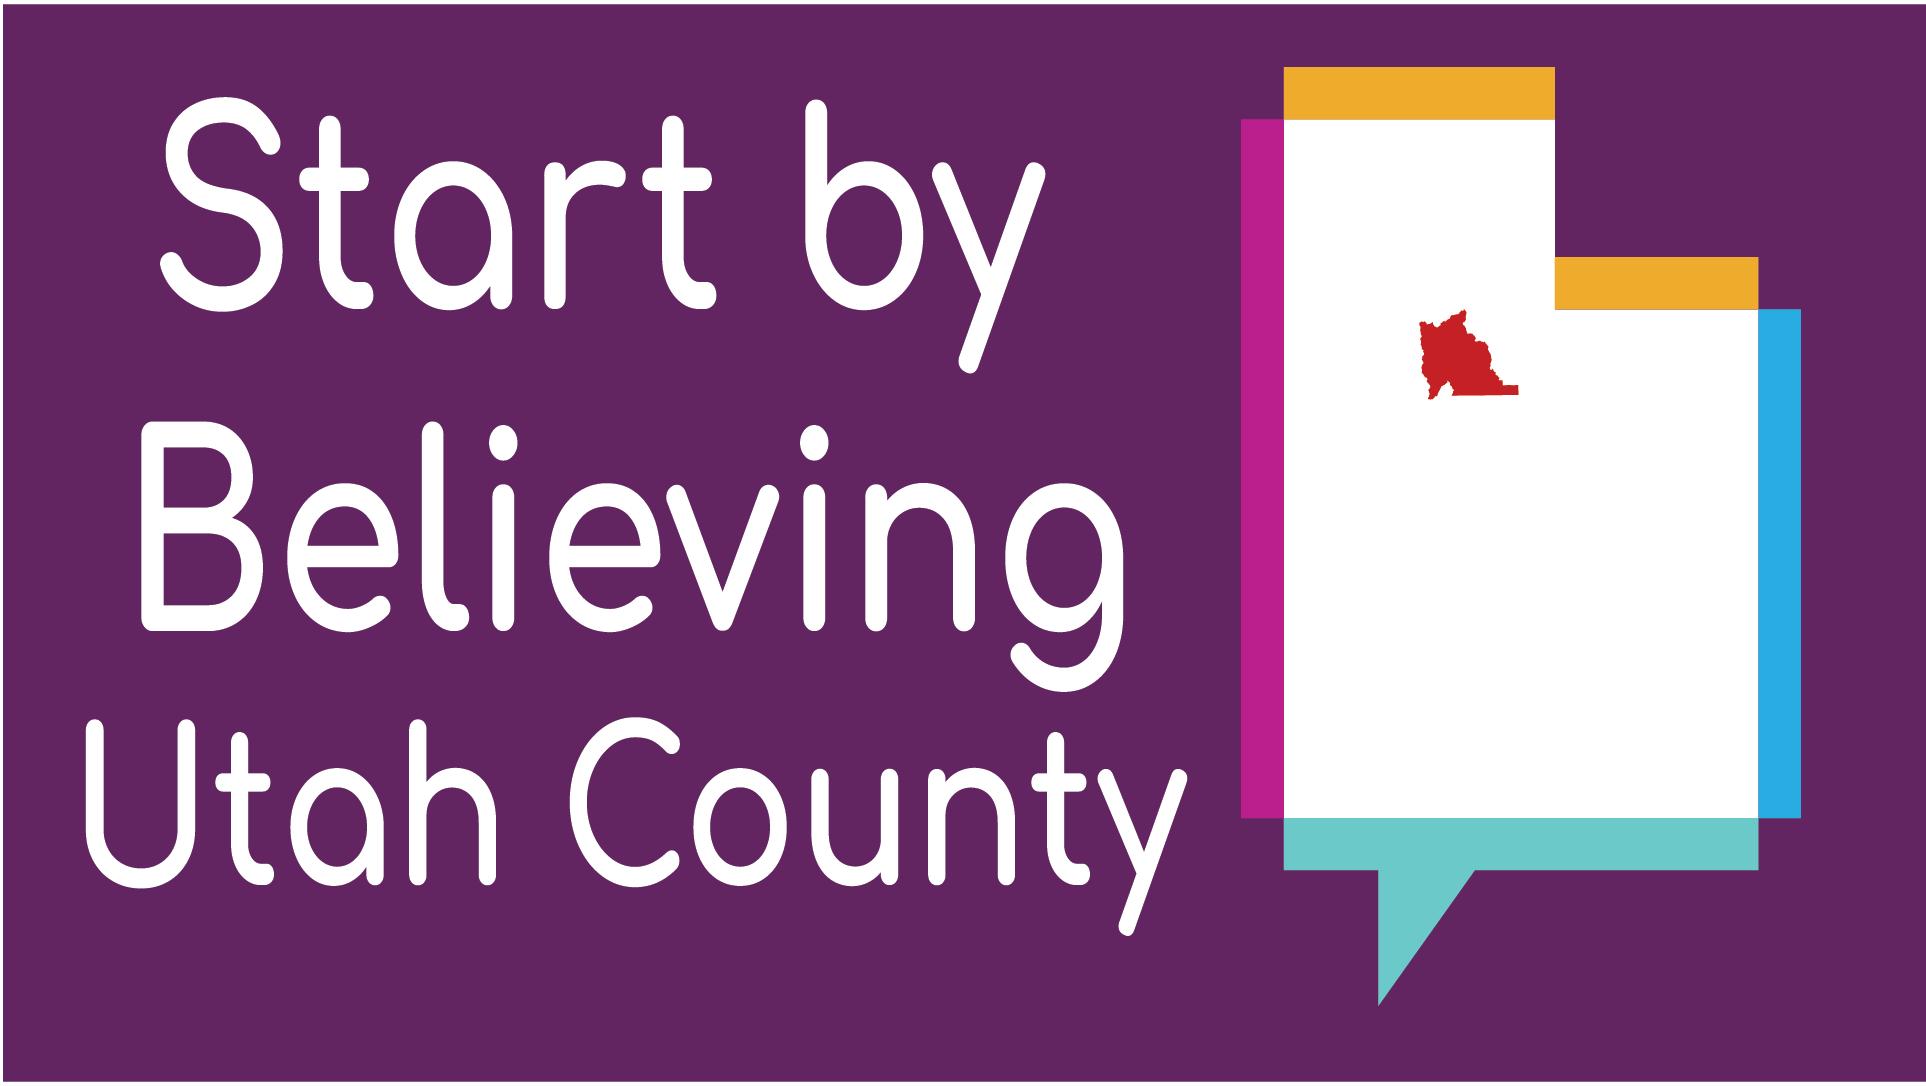 SBB_Utah_County_Event_Banner-01.png